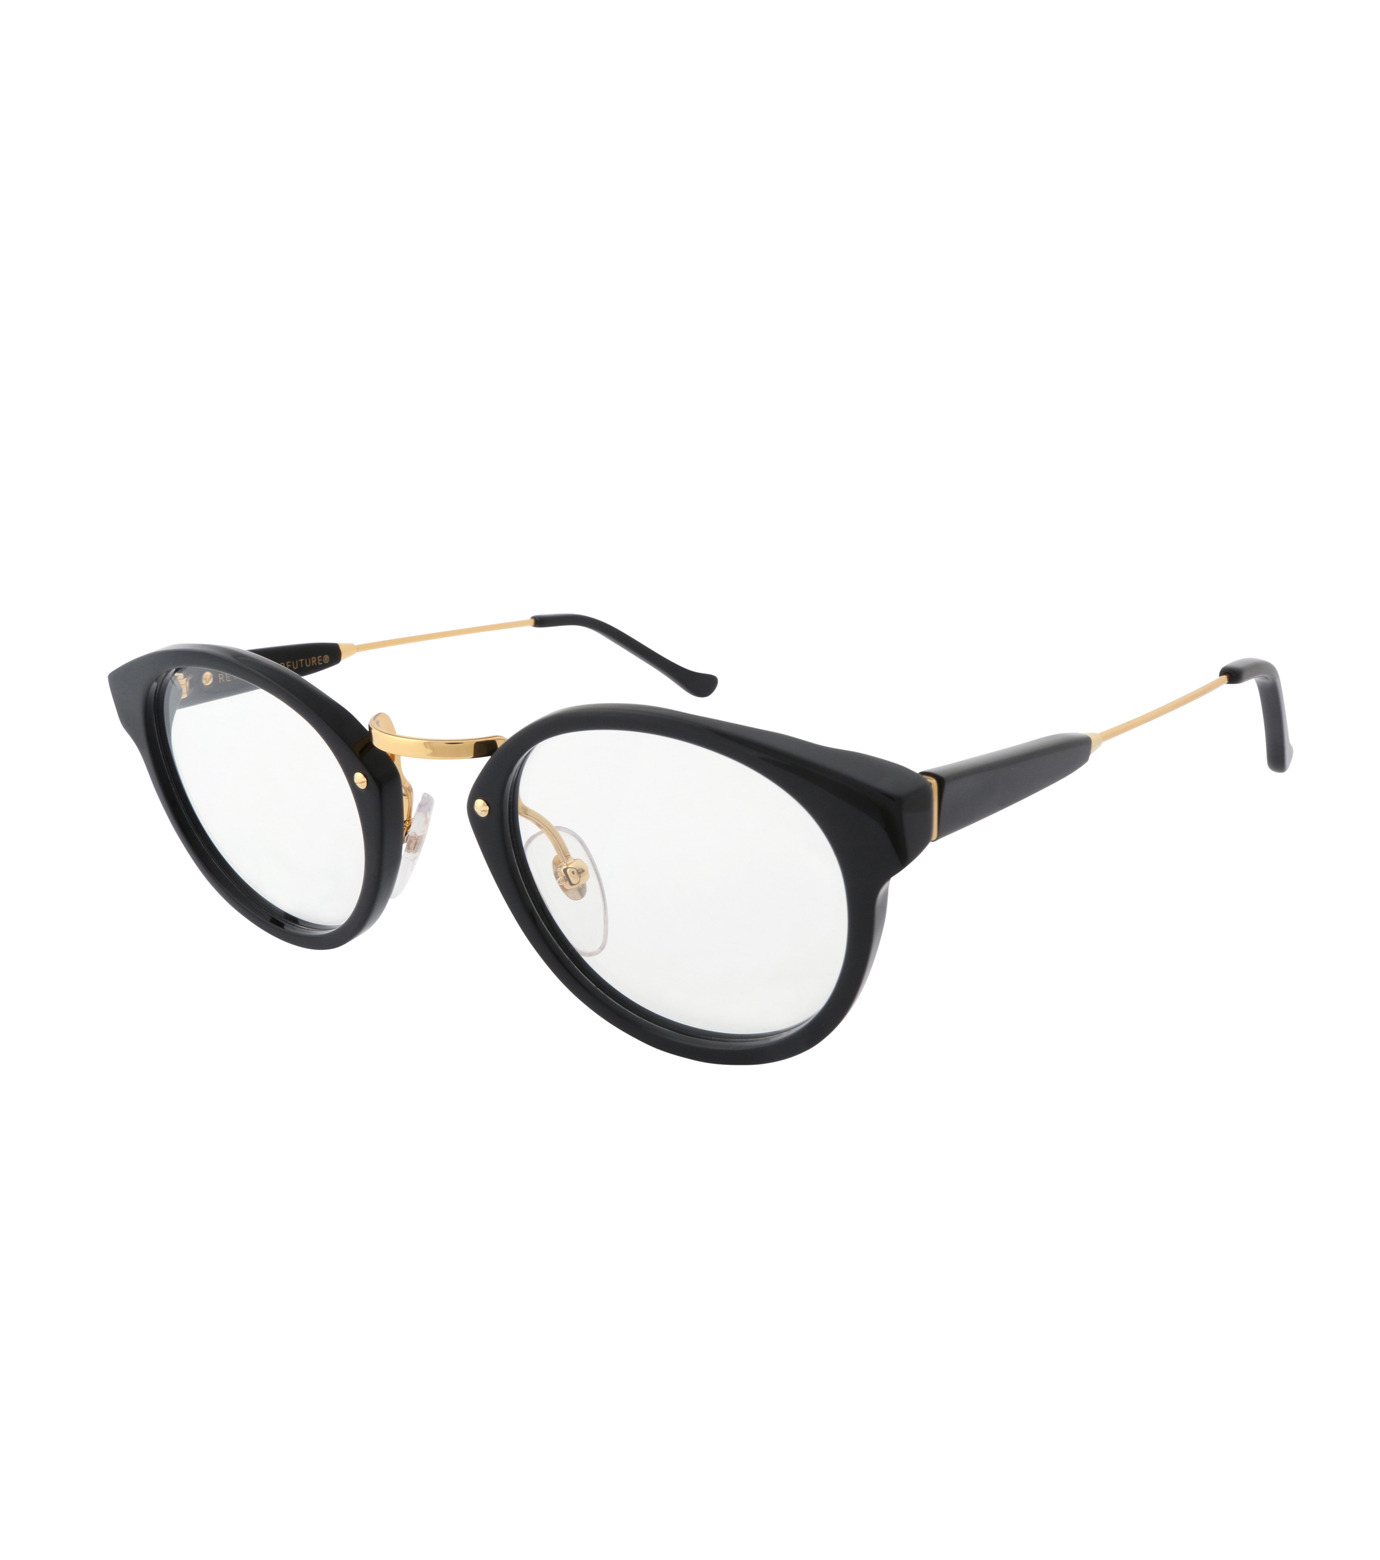 SUPER(スーパー)のPANAMA BLACK CLEAR LENS-BLACK(アイウェア/eyewear)-SPRXXXX054-13 拡大詳細画像1